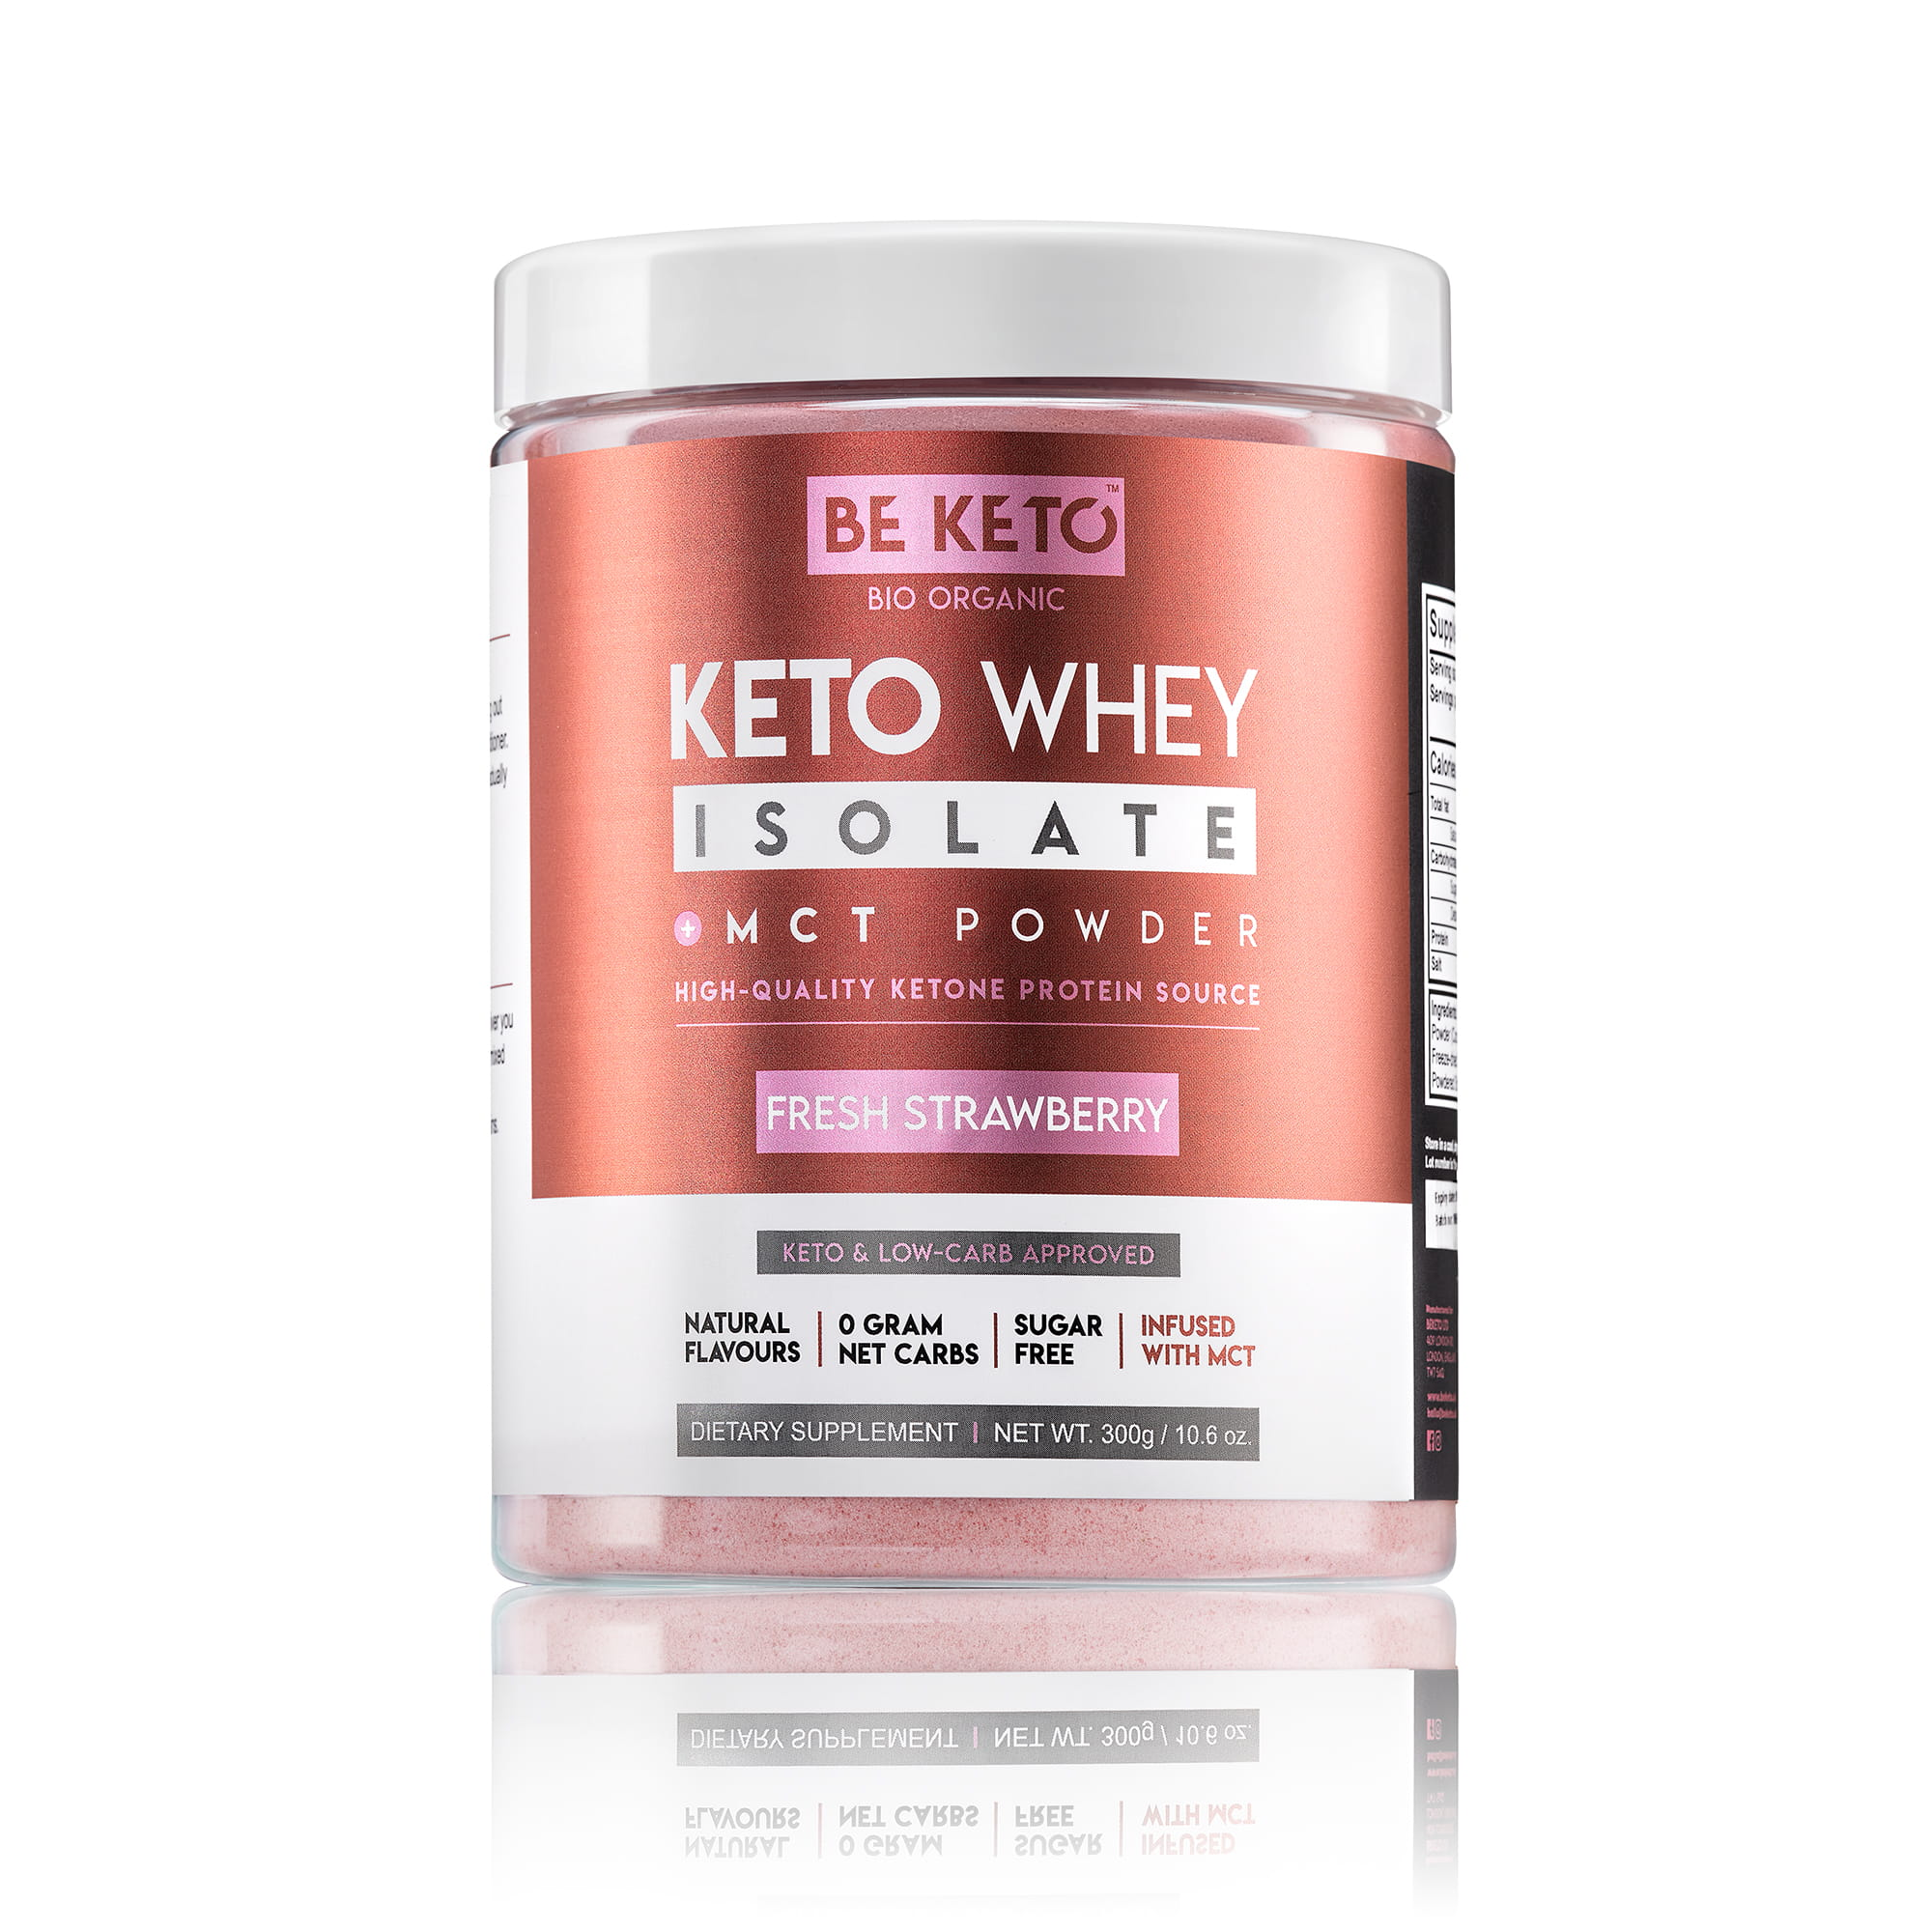 Keto Whey isolate + MCT - Fresh Strawberry 300G